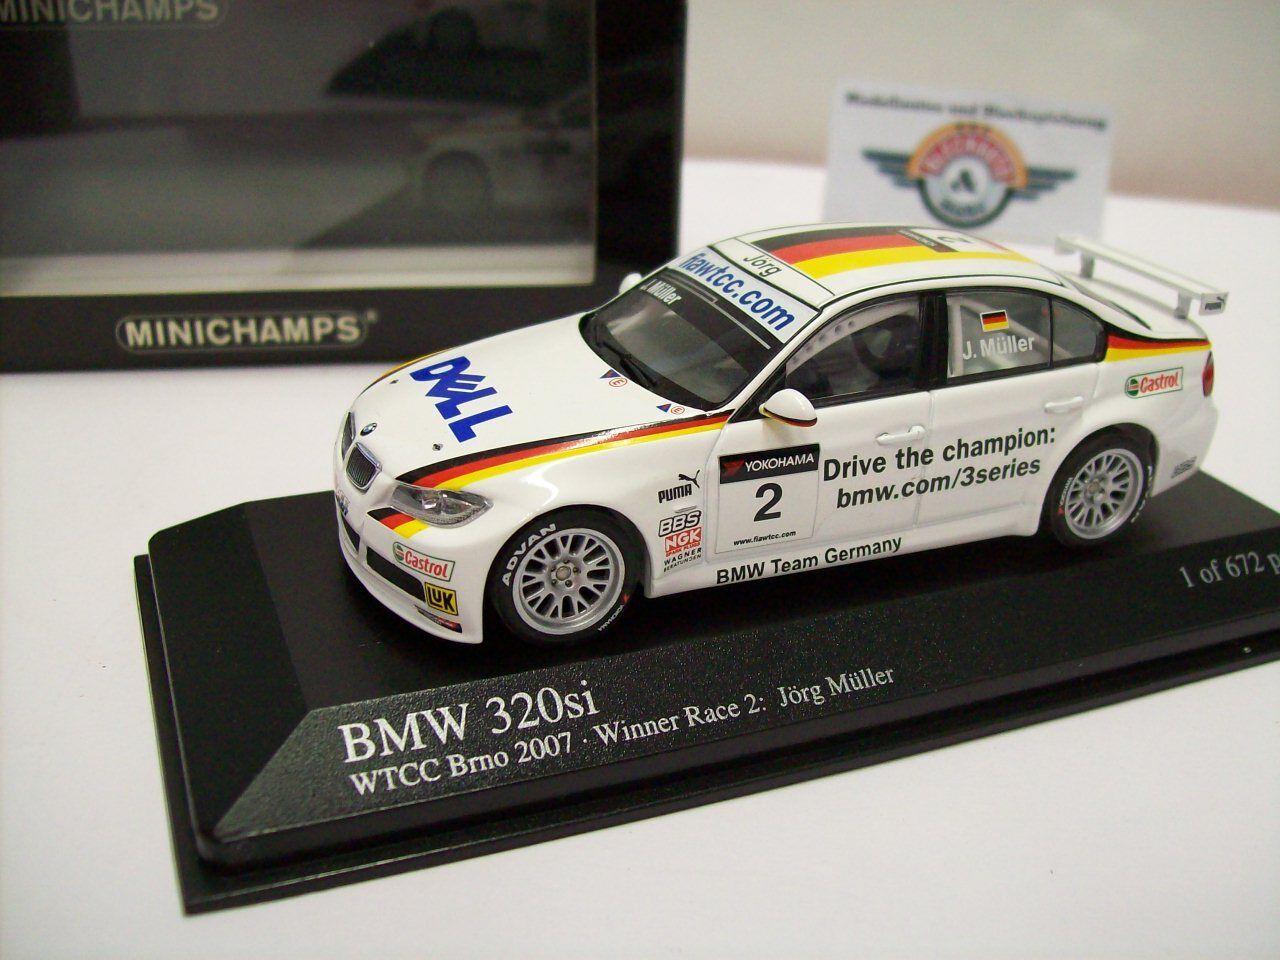 BMW 320si  e92   2  WTCC Brno 2007 , bianco, Minichamps 1:43, OVP